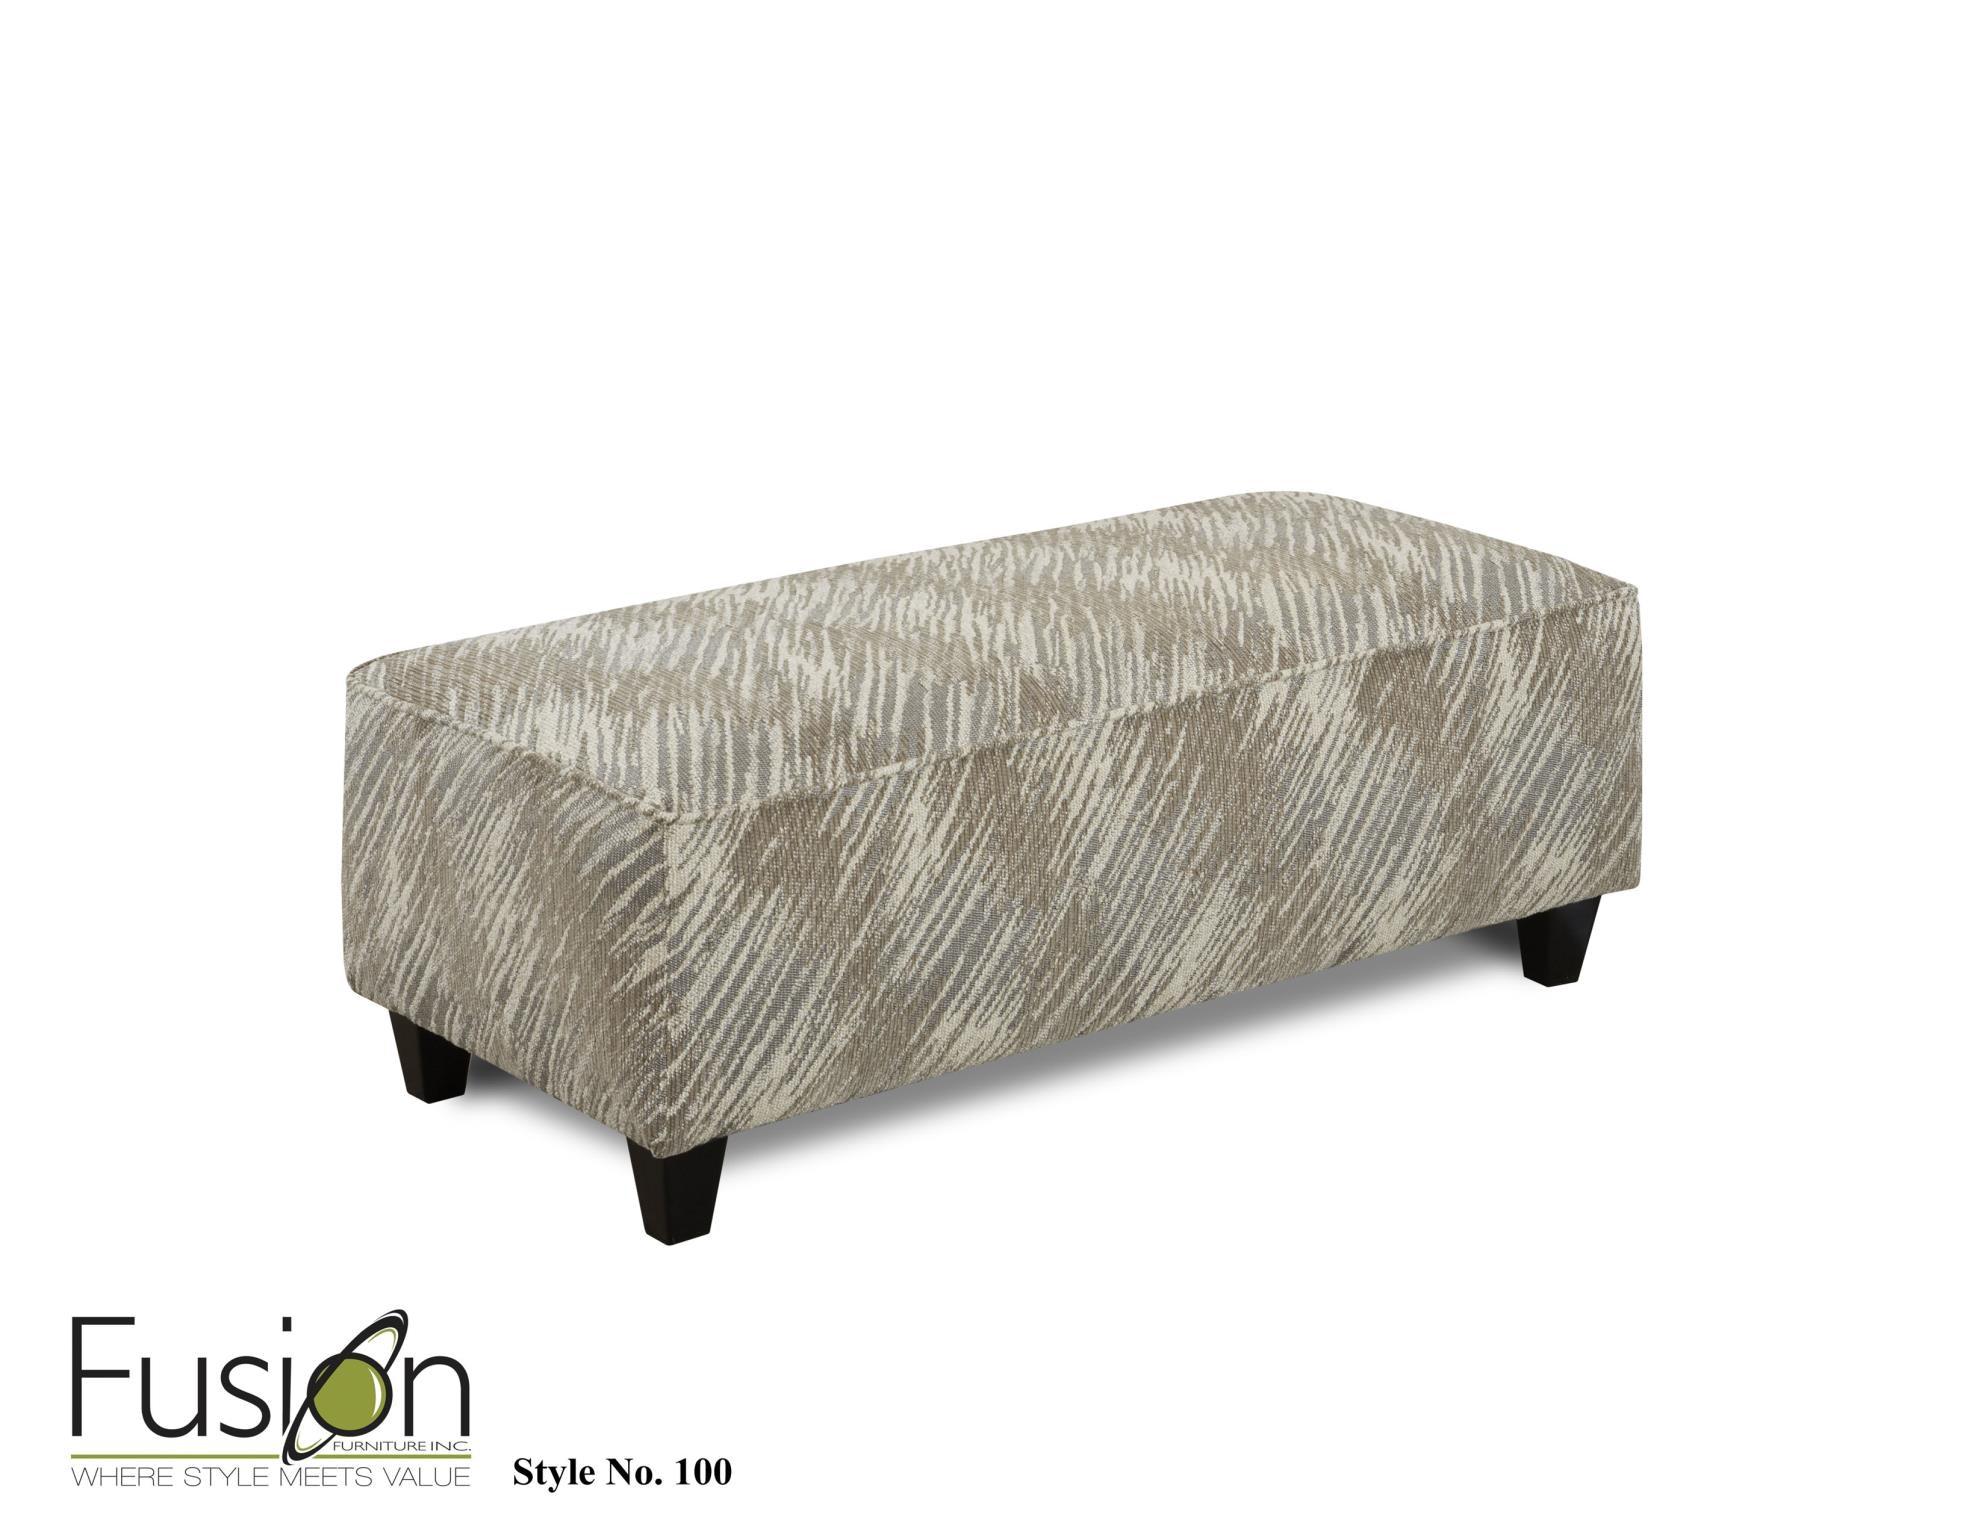 Beau Fusion Living Room Ottoman 100Desert Retreat Stone At Priba Furniture And  Interiors